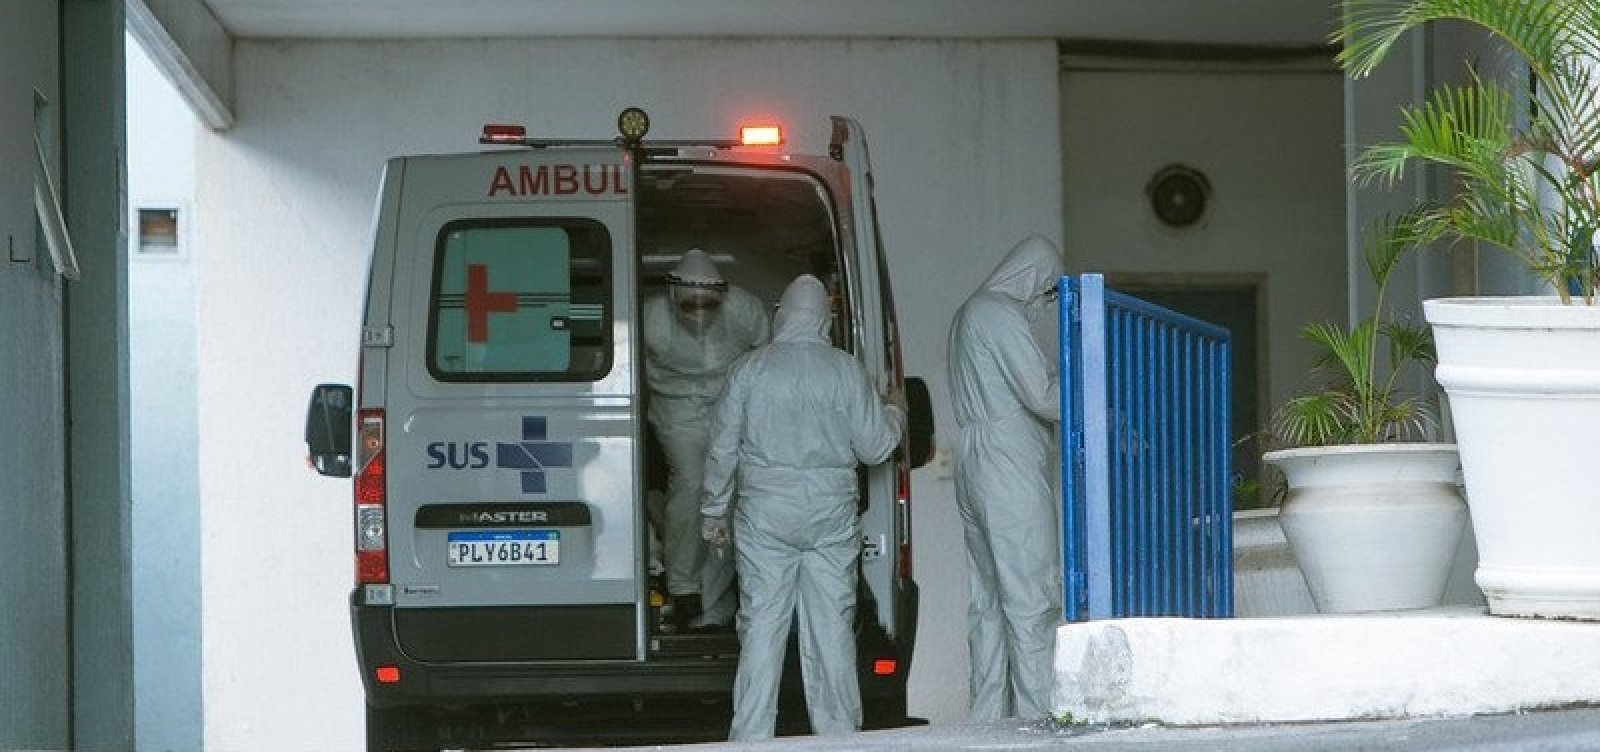 [Brasil tem 62.304 mortes por Covid-19, diz consórcio de imprensa ]